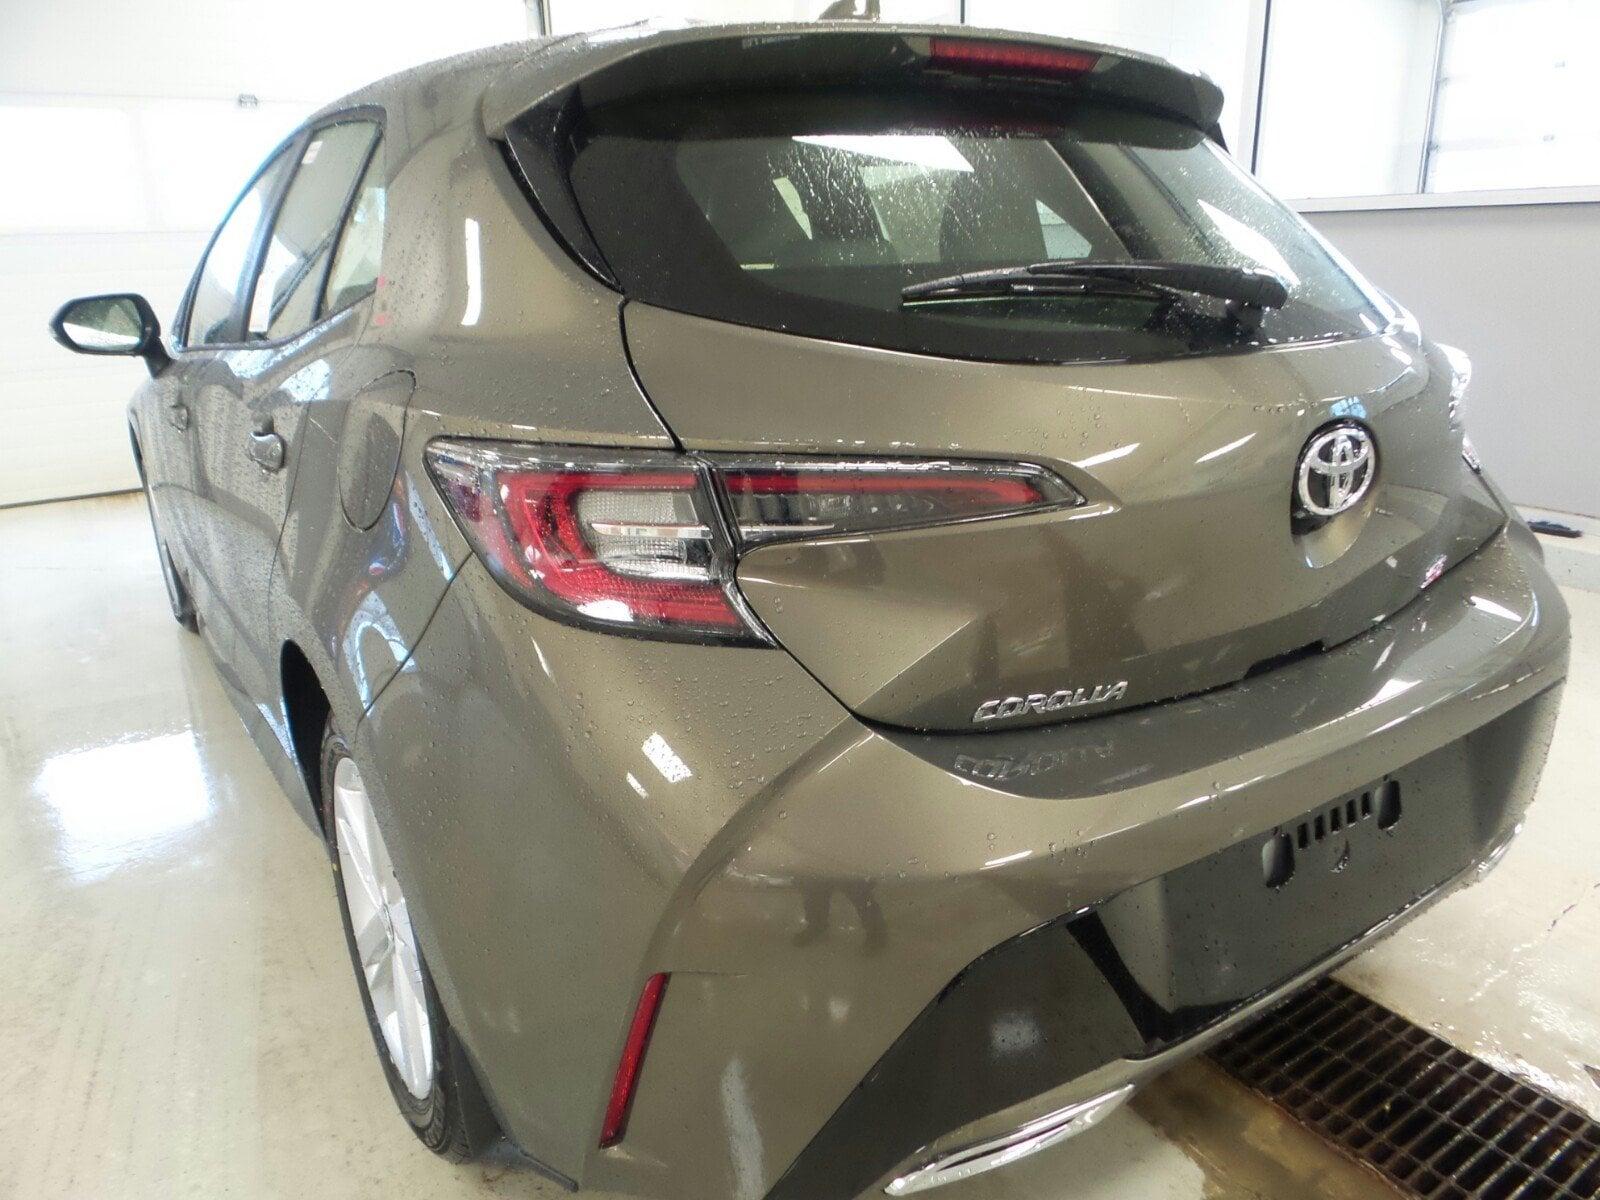 New 2019 Toyota Corolla Hatchback For Sale | Franklin PA | VIN